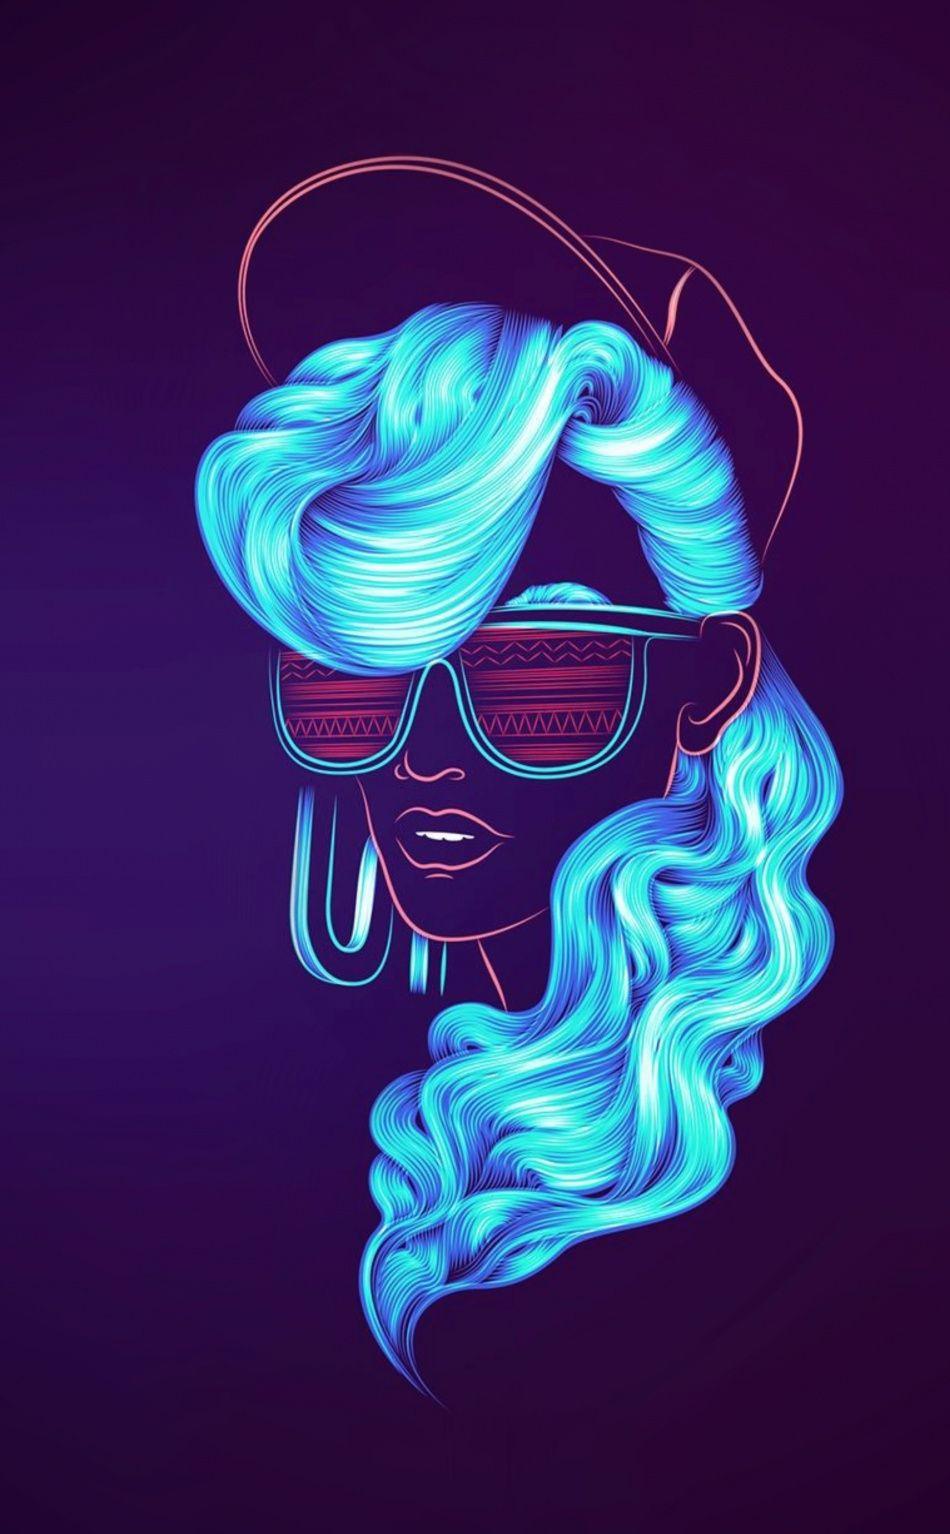 Neonwave Girl Blue Hair Portrait Wallpaper Patrick Seymour Neon Girl Neon Wallpaper